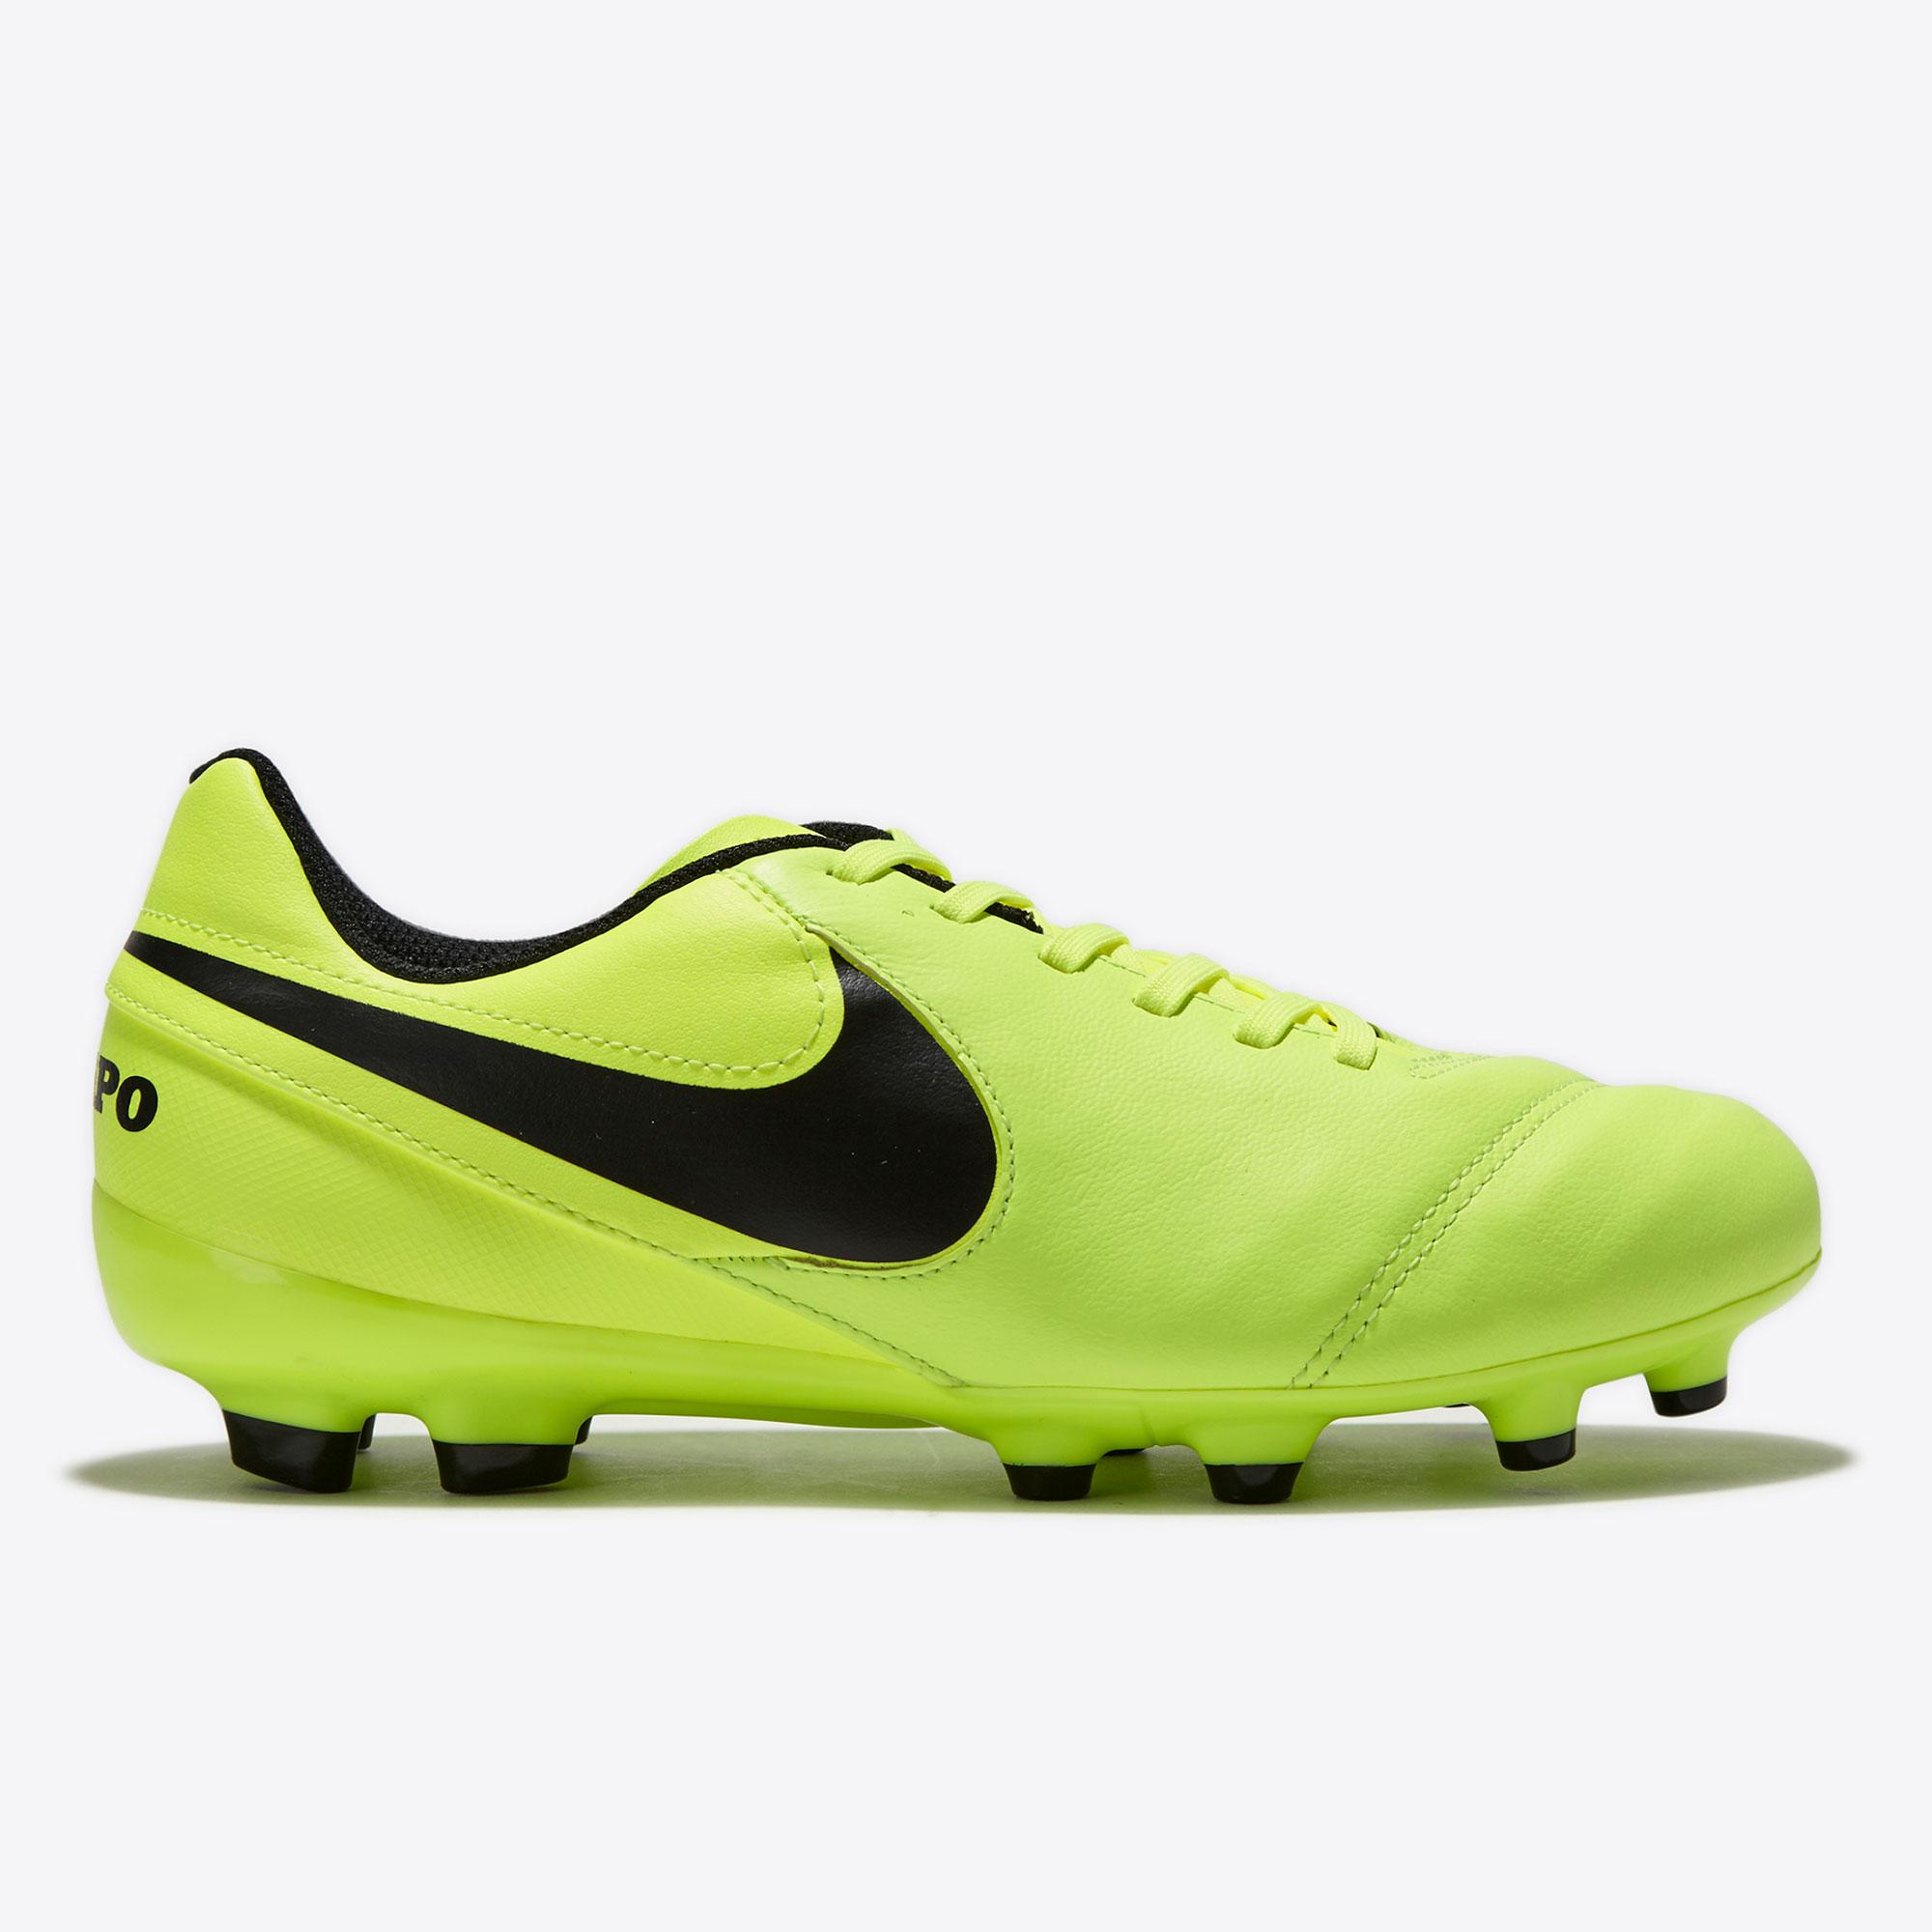 Nike Tiempo Legend VI FG Volt/Black/Volt K